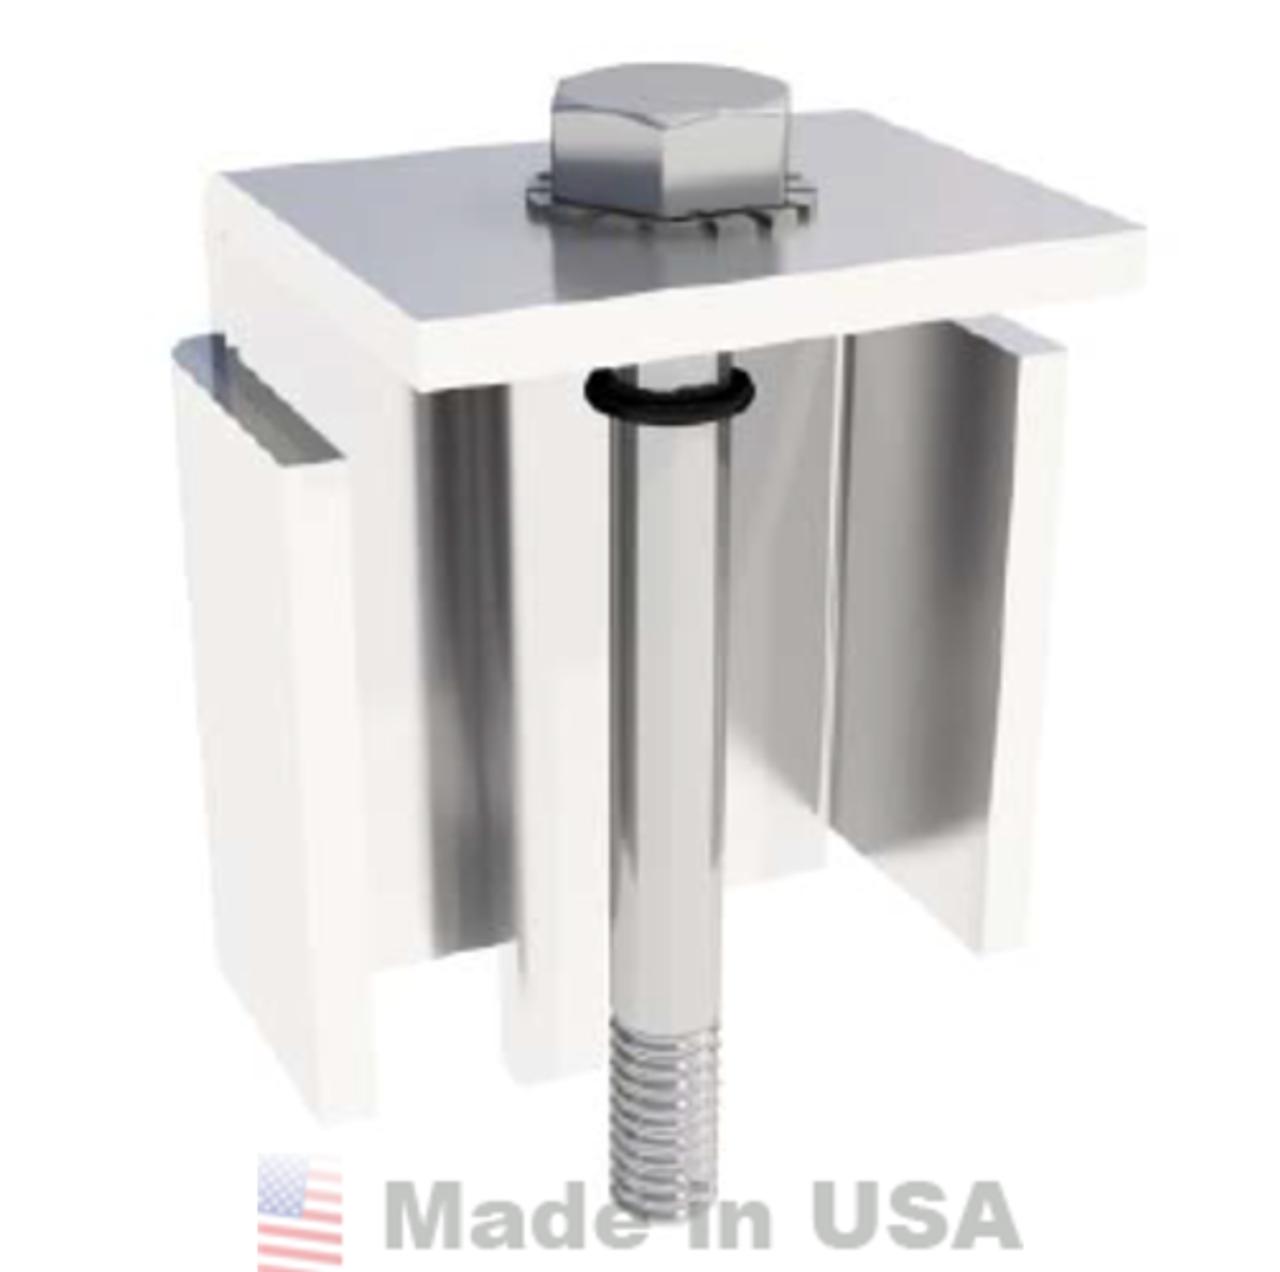 IronRidge BRM Ballast Module Clamp (Fits 34.5mm - 35.4mm)